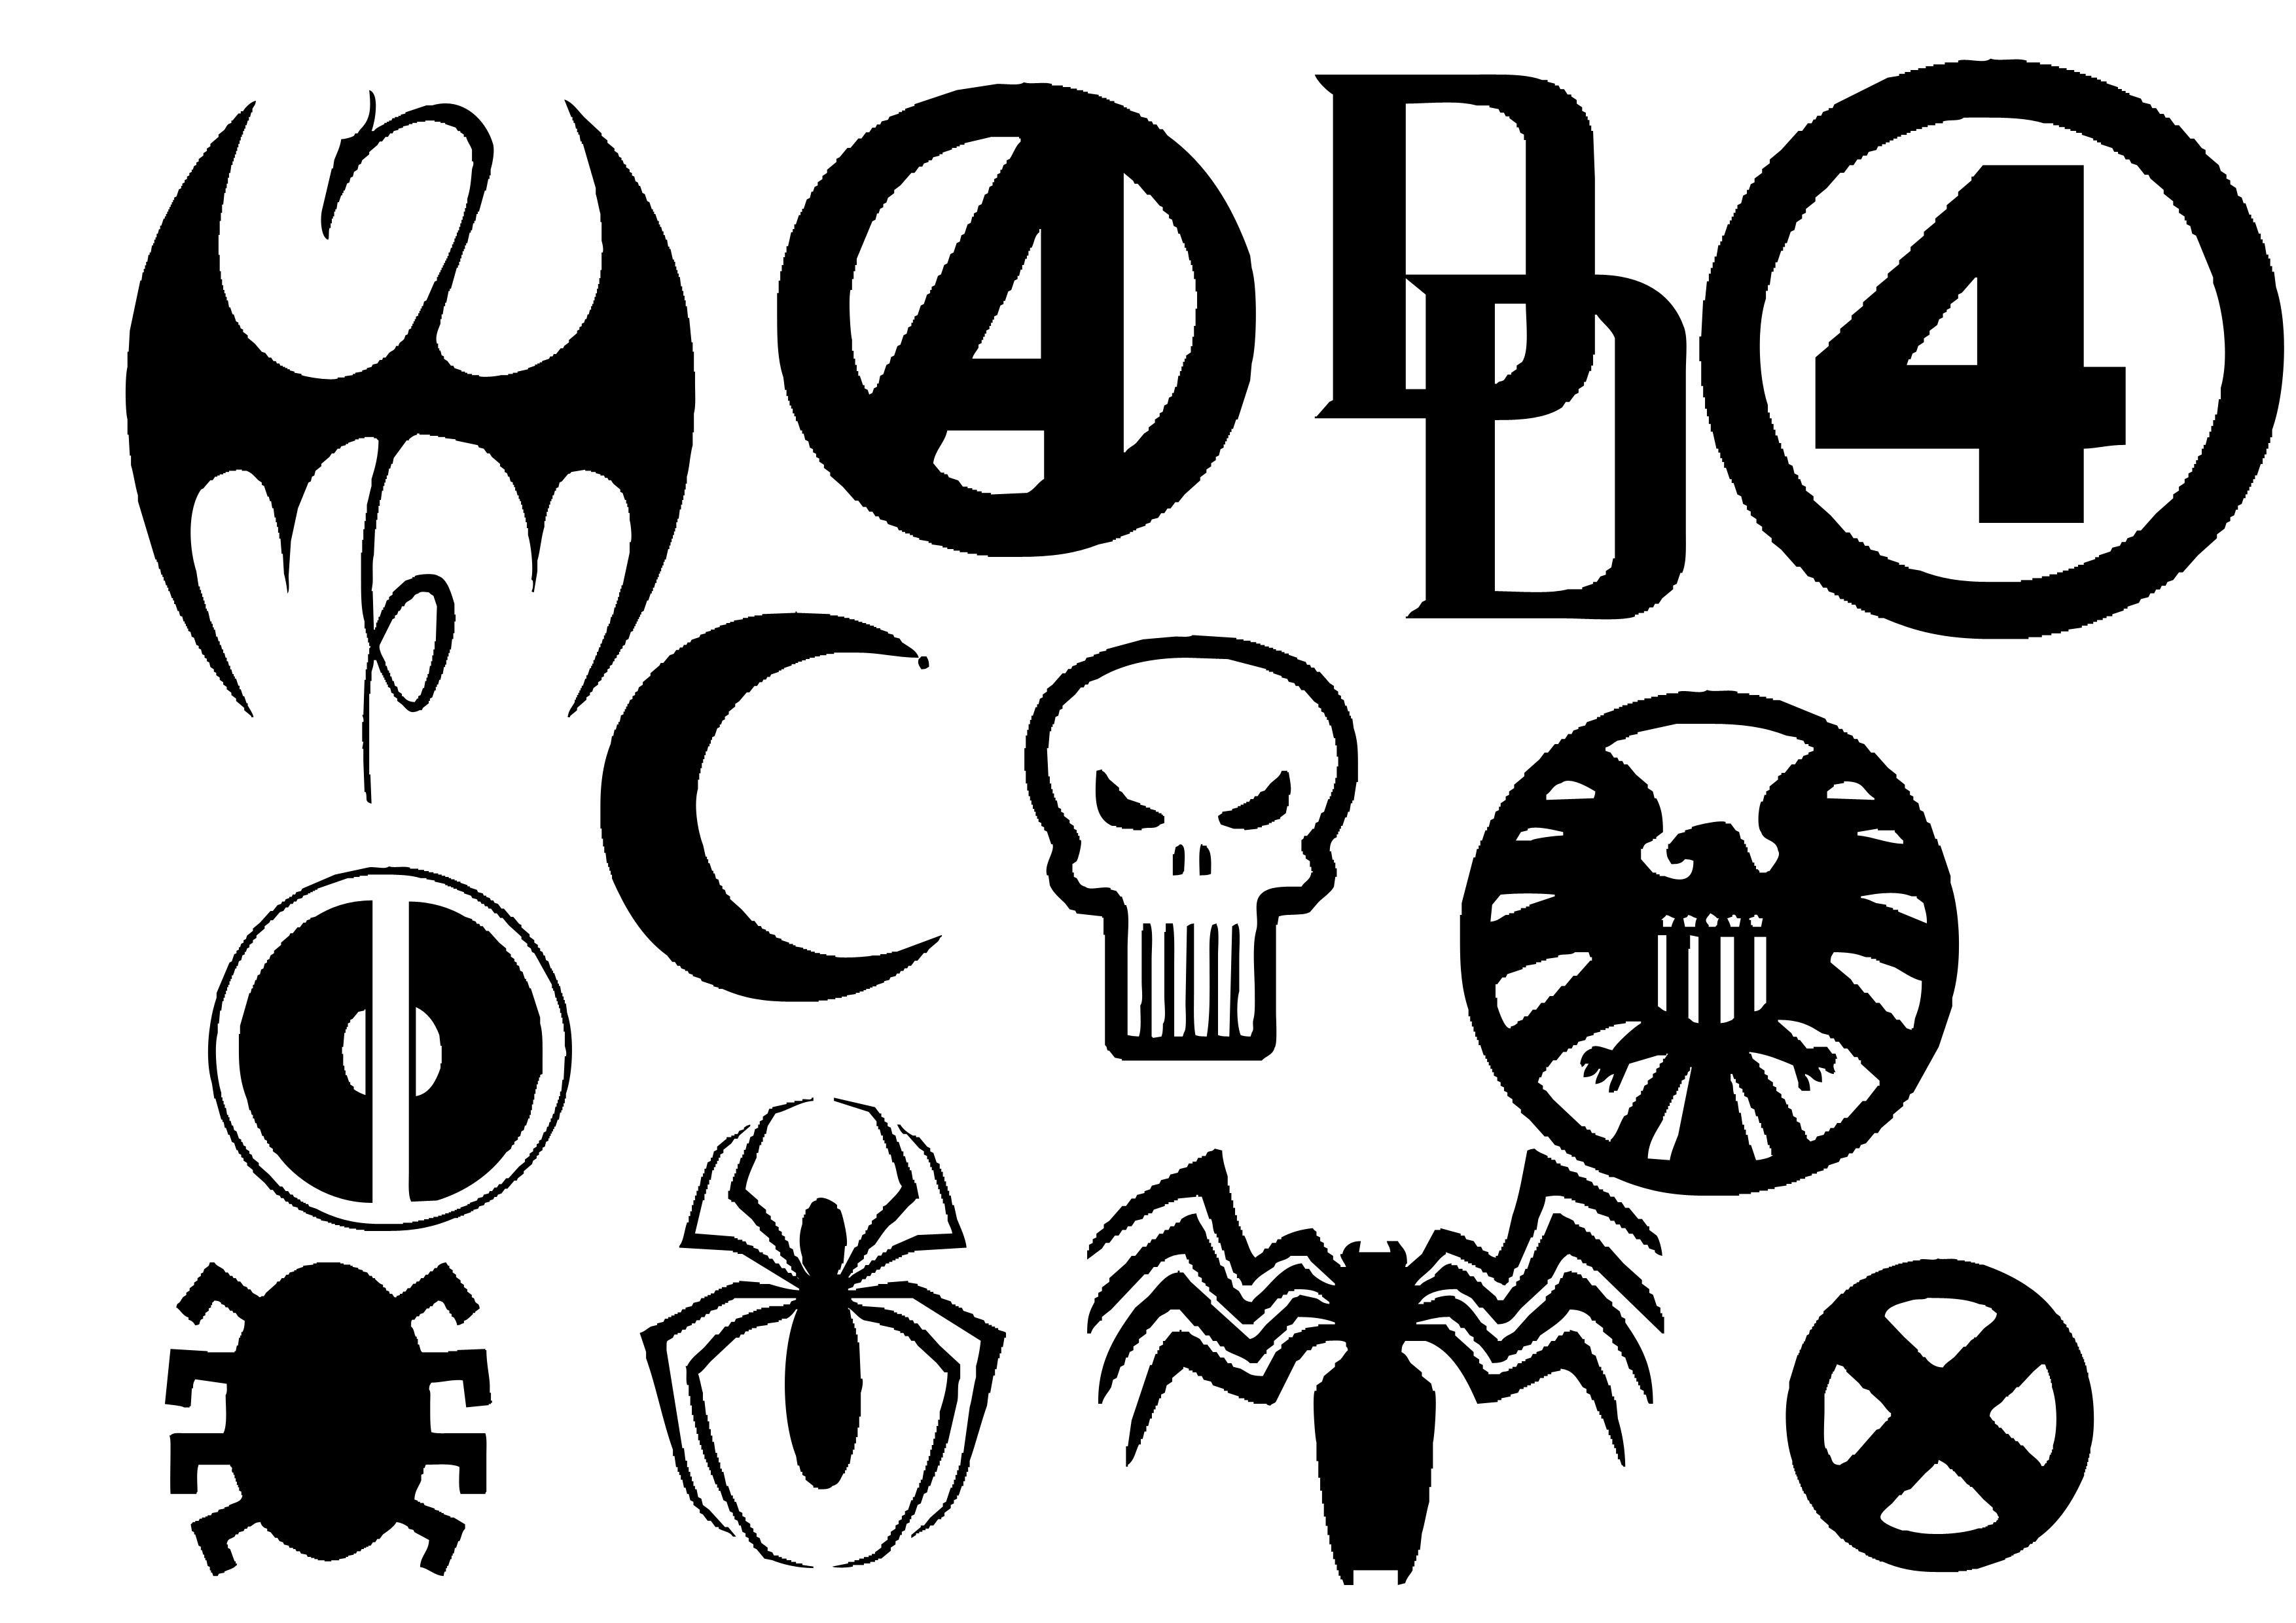 Marvel Hero Insignia by Geekbot71 on DeviantArt